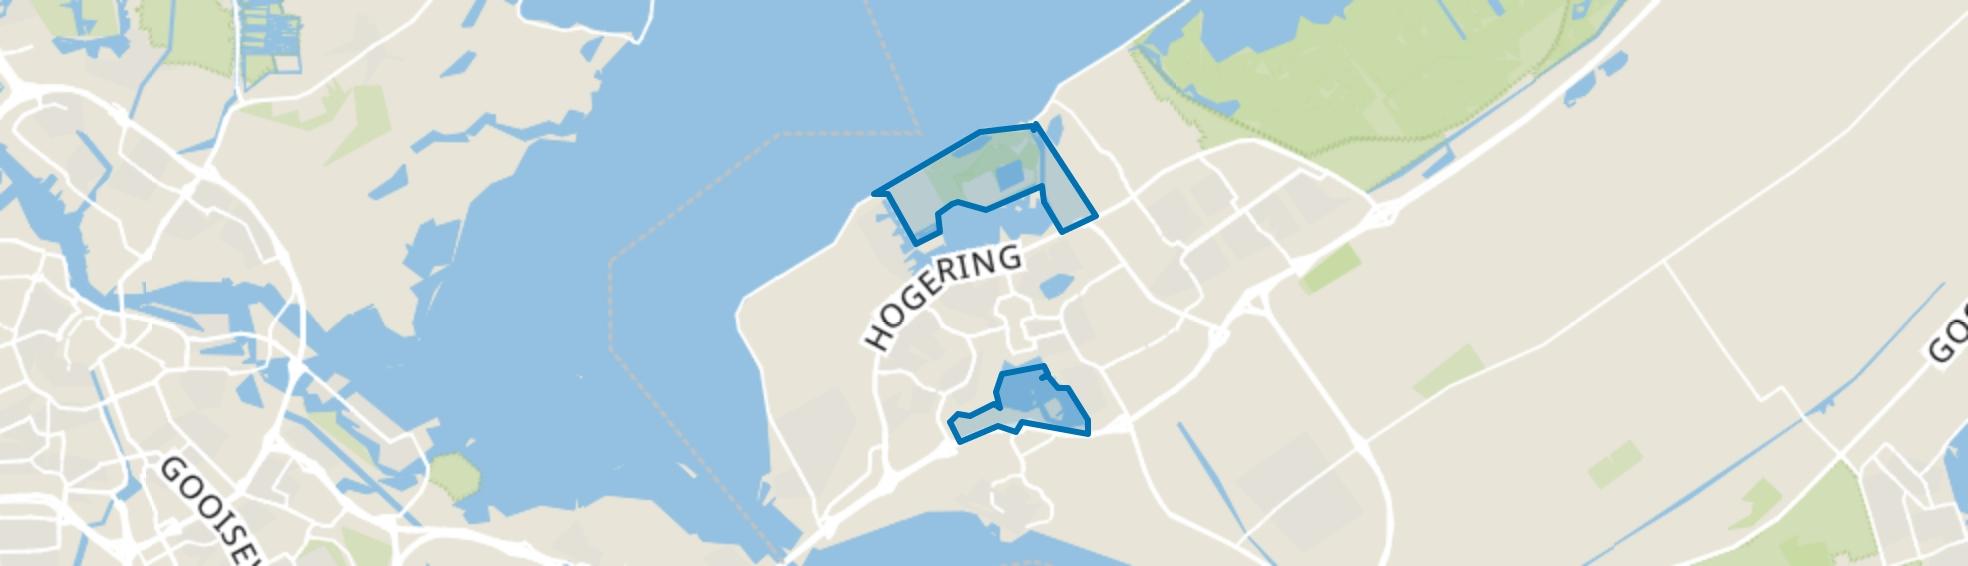 Overig Almere Stad, Almere map